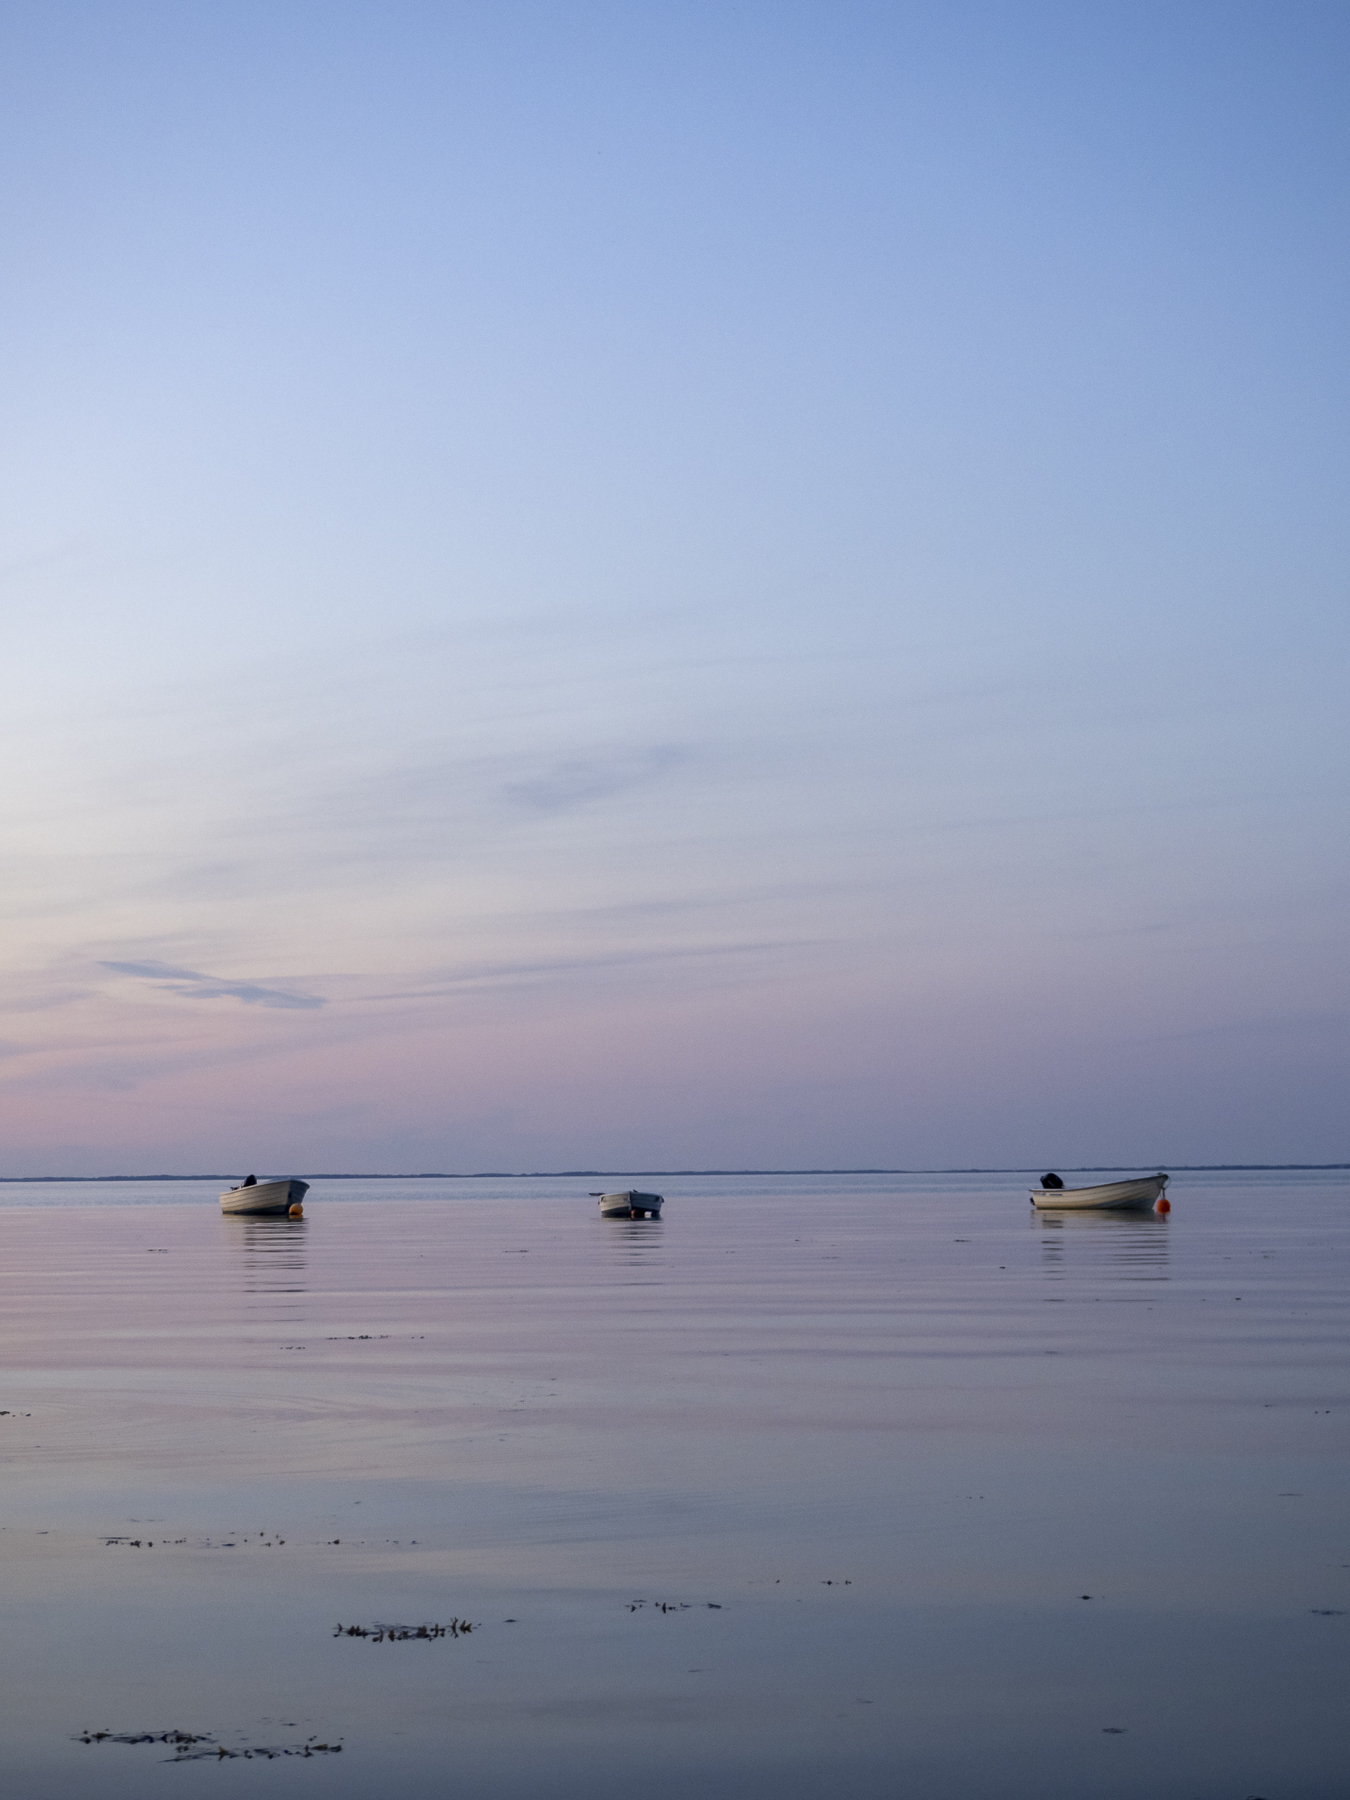 Strand på Tuse Næs